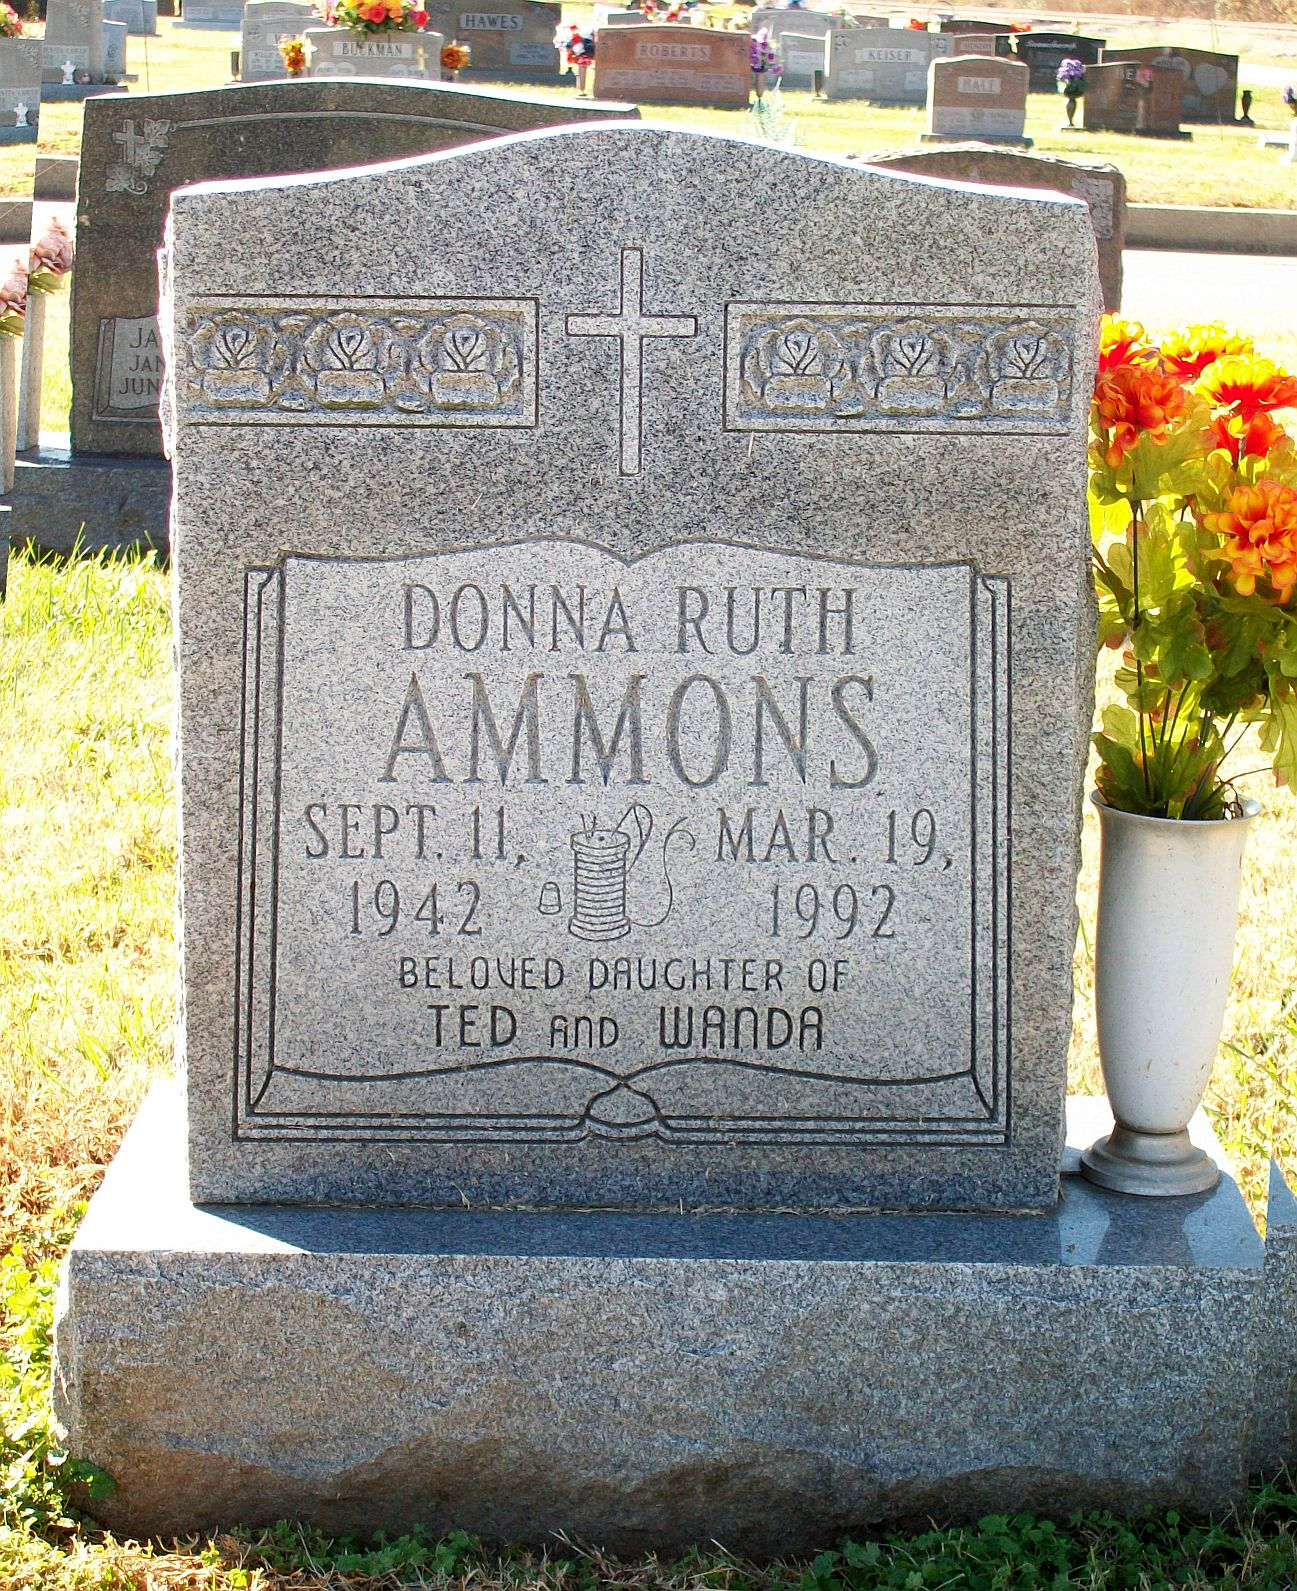 Donna Ruth Ammons